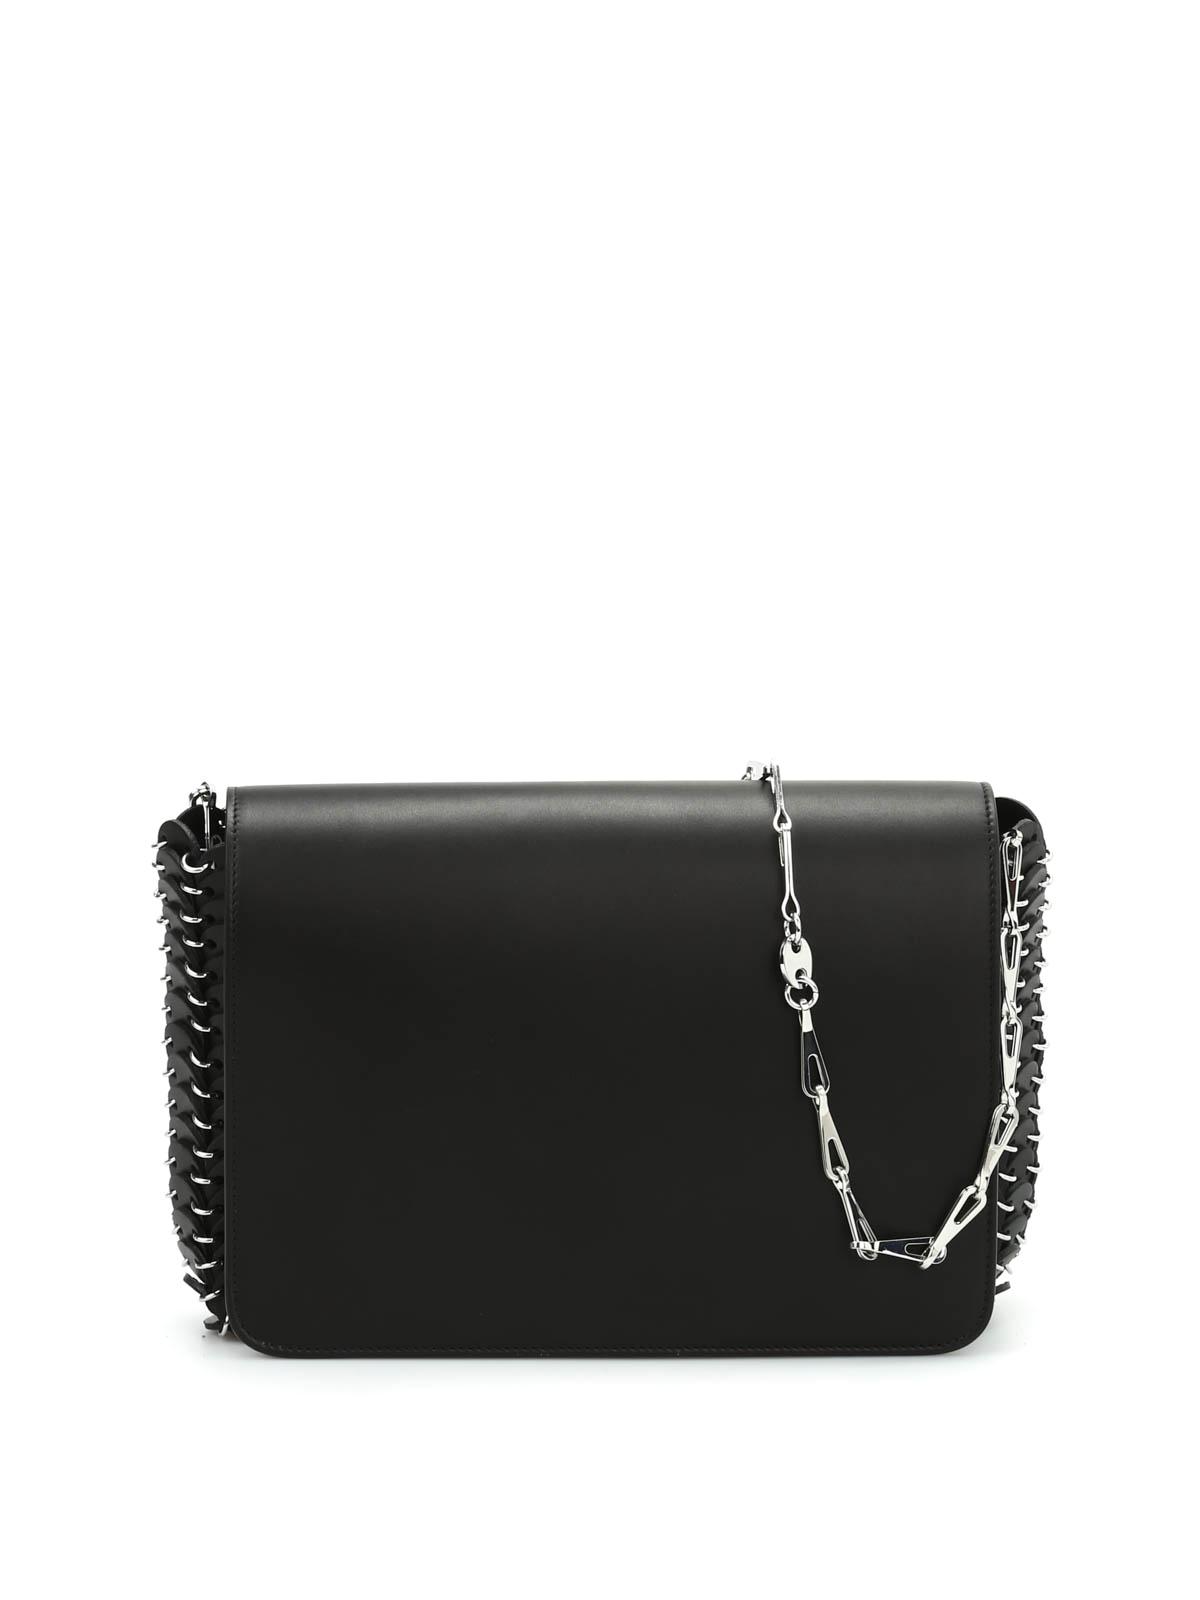 60b42322fc6d Paco Rabanne - Leather discs Shoulder bag - shoulder bags ...